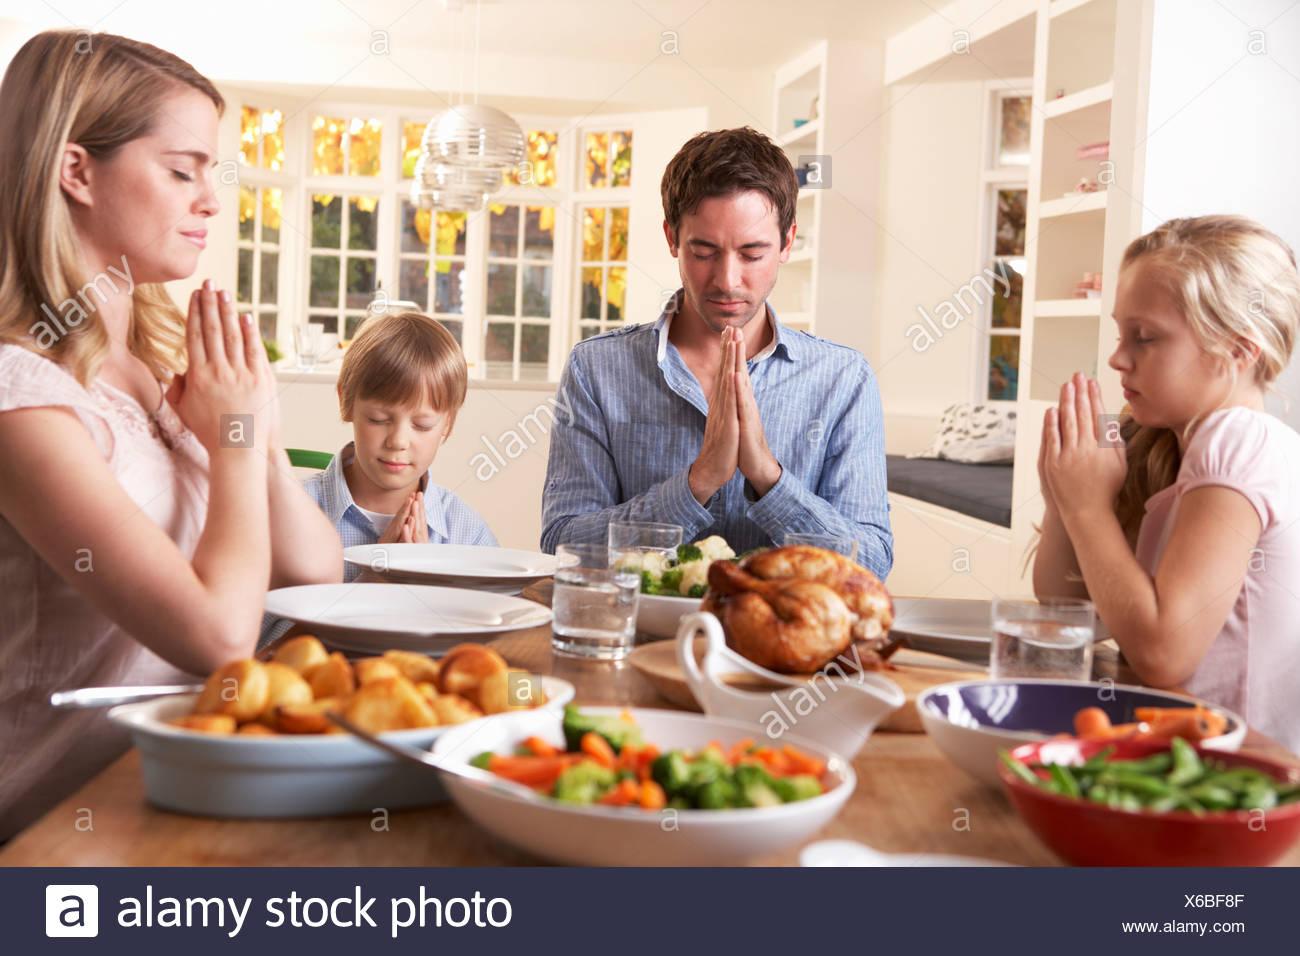 family saying prayer before